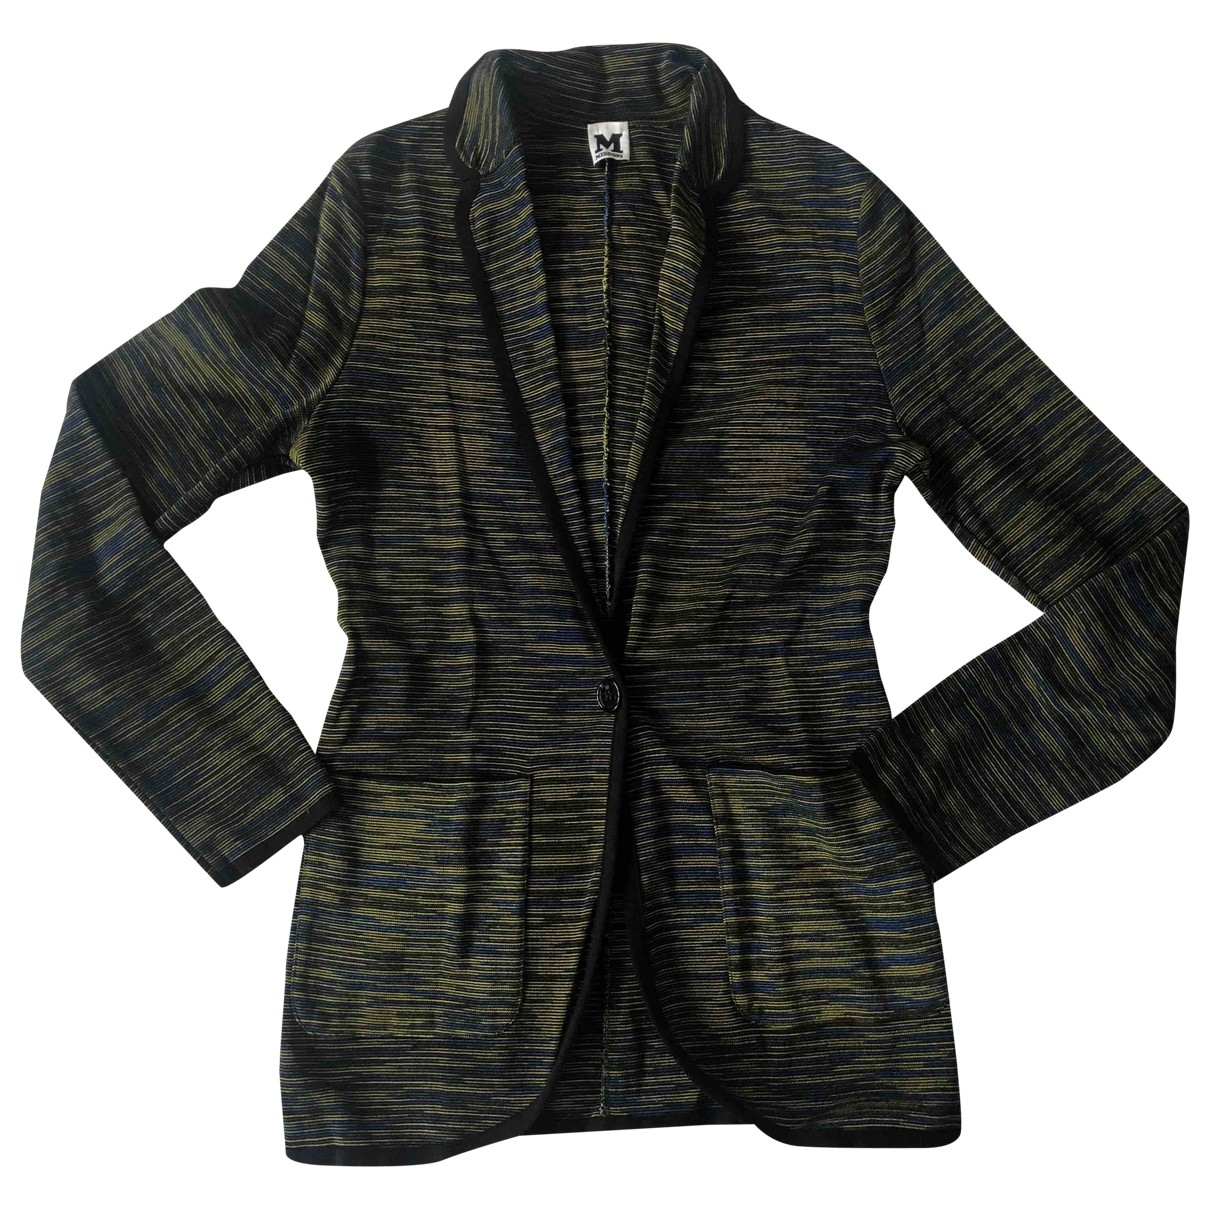 M Missoni \N Green Cotton jacket for Women 44 IT